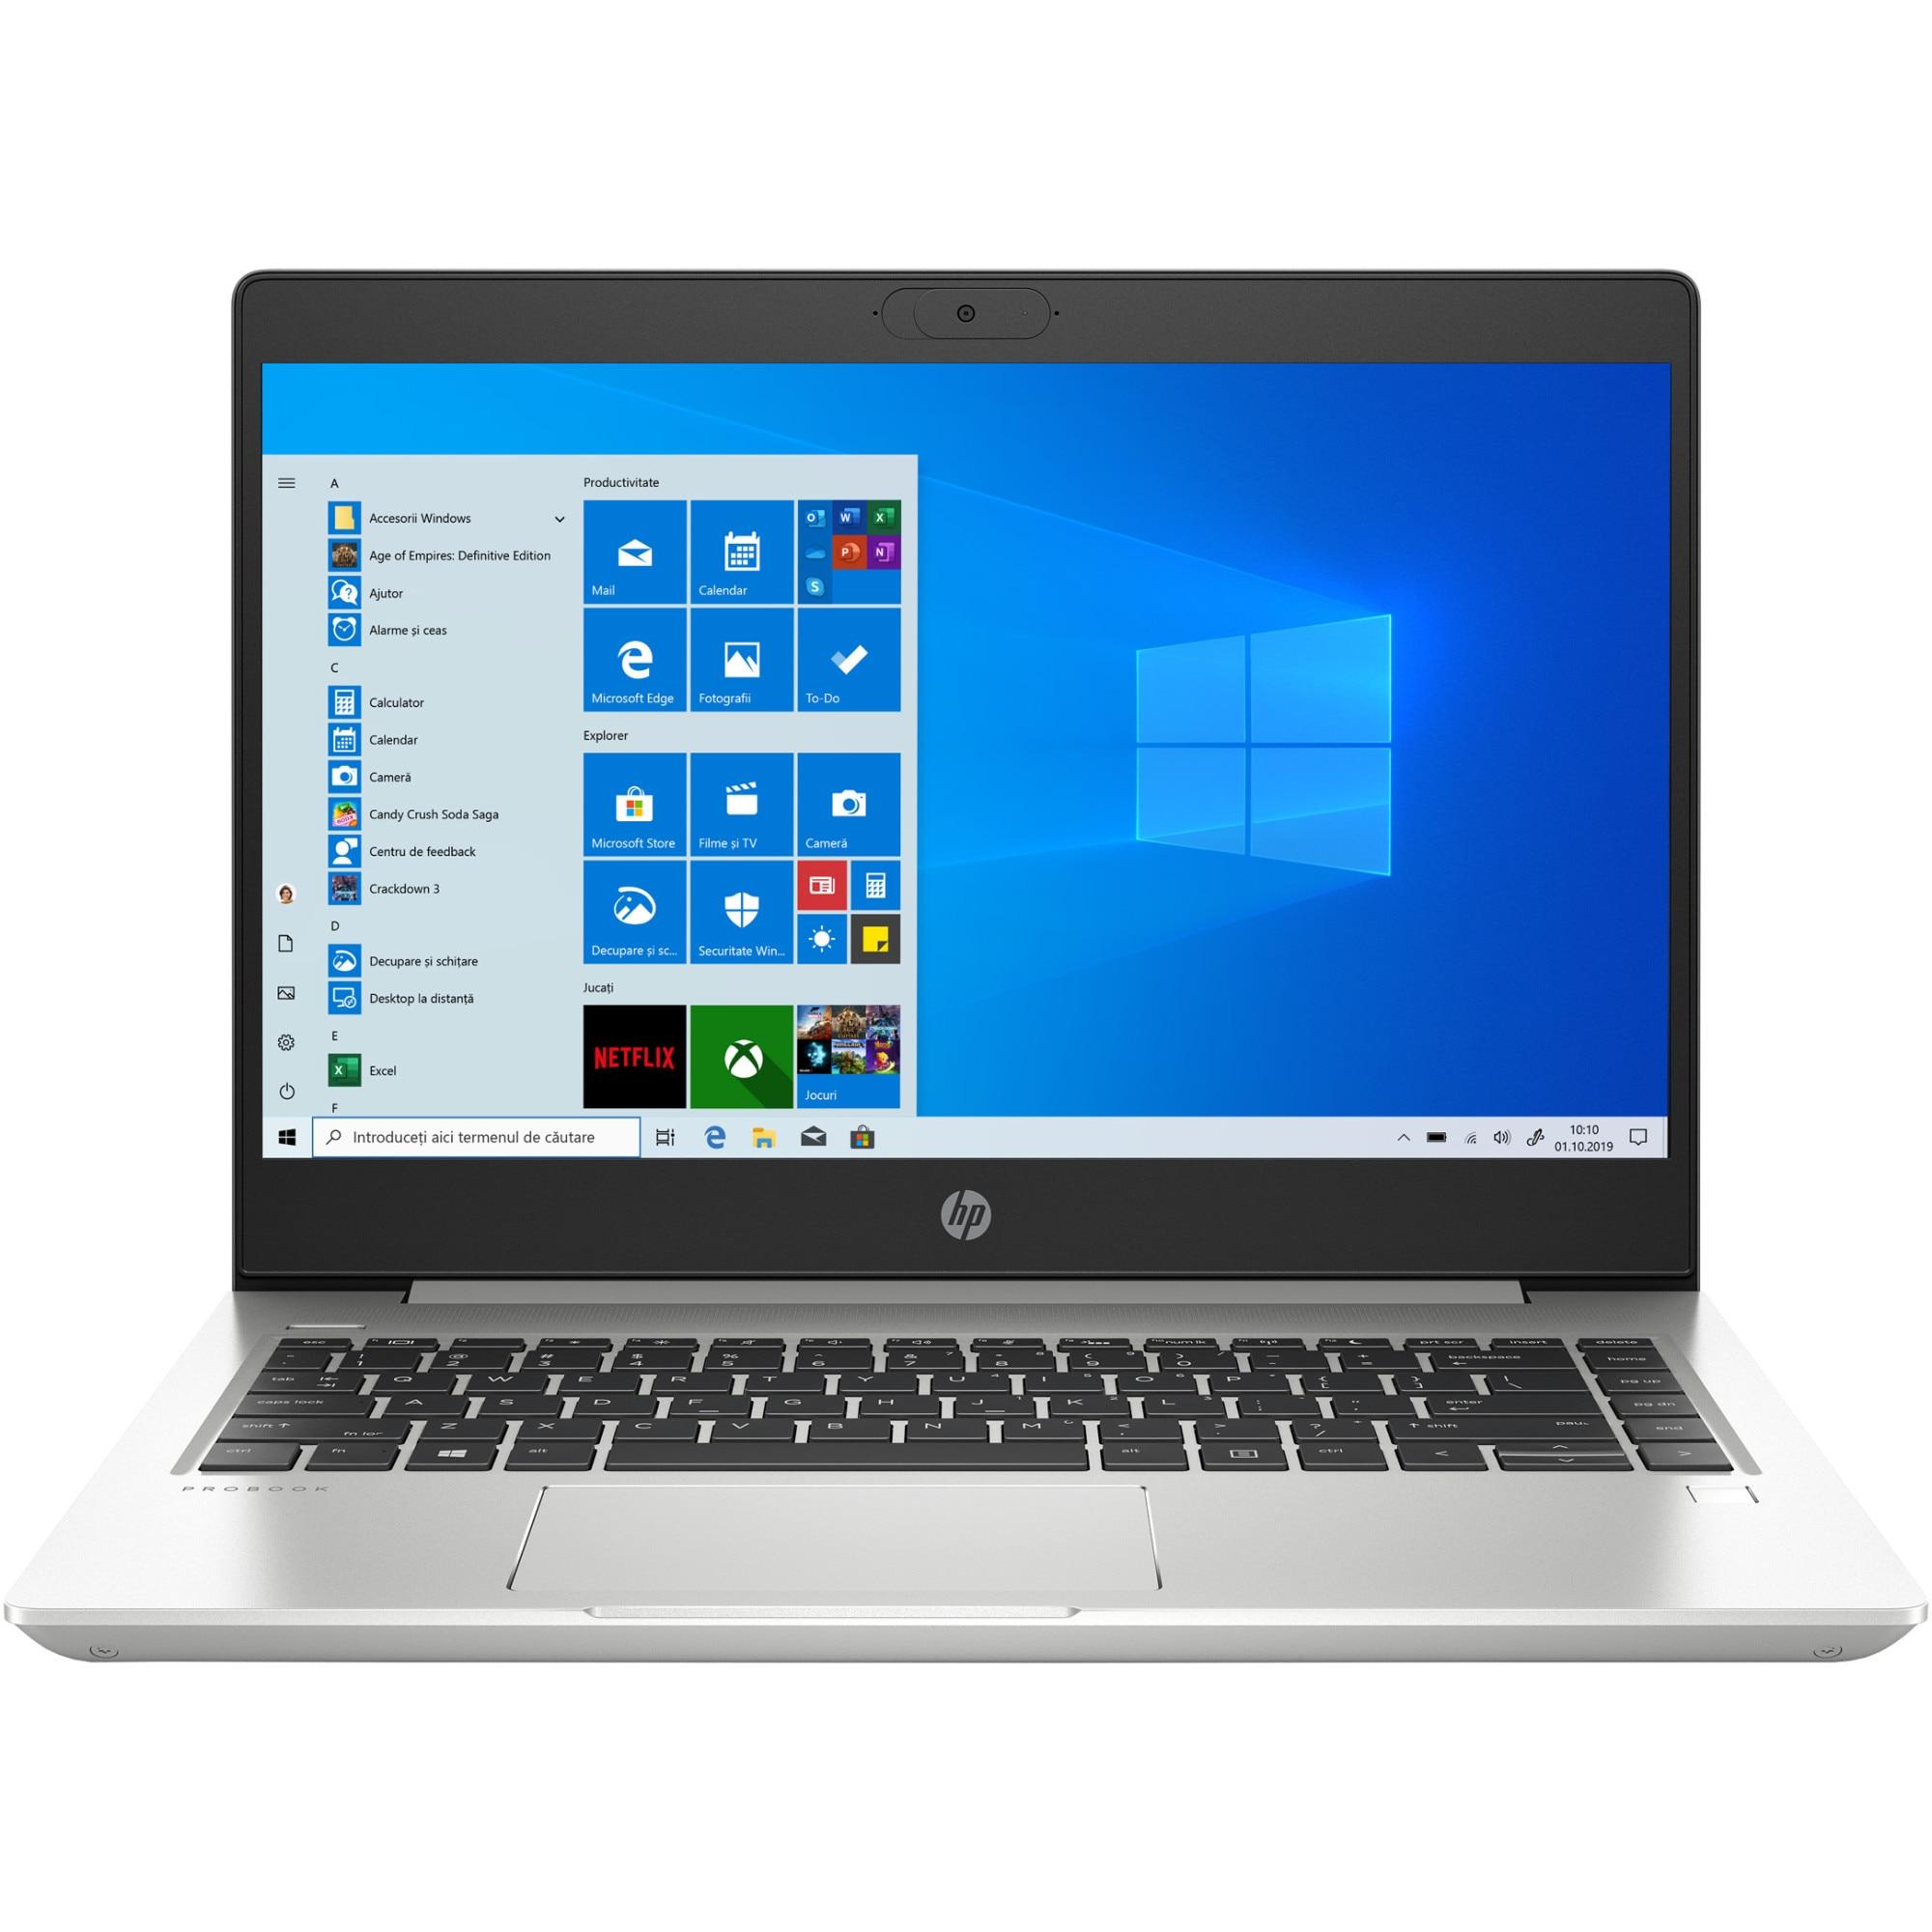 "Fotografie Laptop ultraportabil HP ProBook 445 G7 cu procesor AMD Ryzen™ 5 4500U pana la 4.00 GHz, 14"", Full HD, 8GB, 1TB HDD+ 256GB SSD, AMD Radeon™ Graphics, Windows 10 Pro, Pike silver"